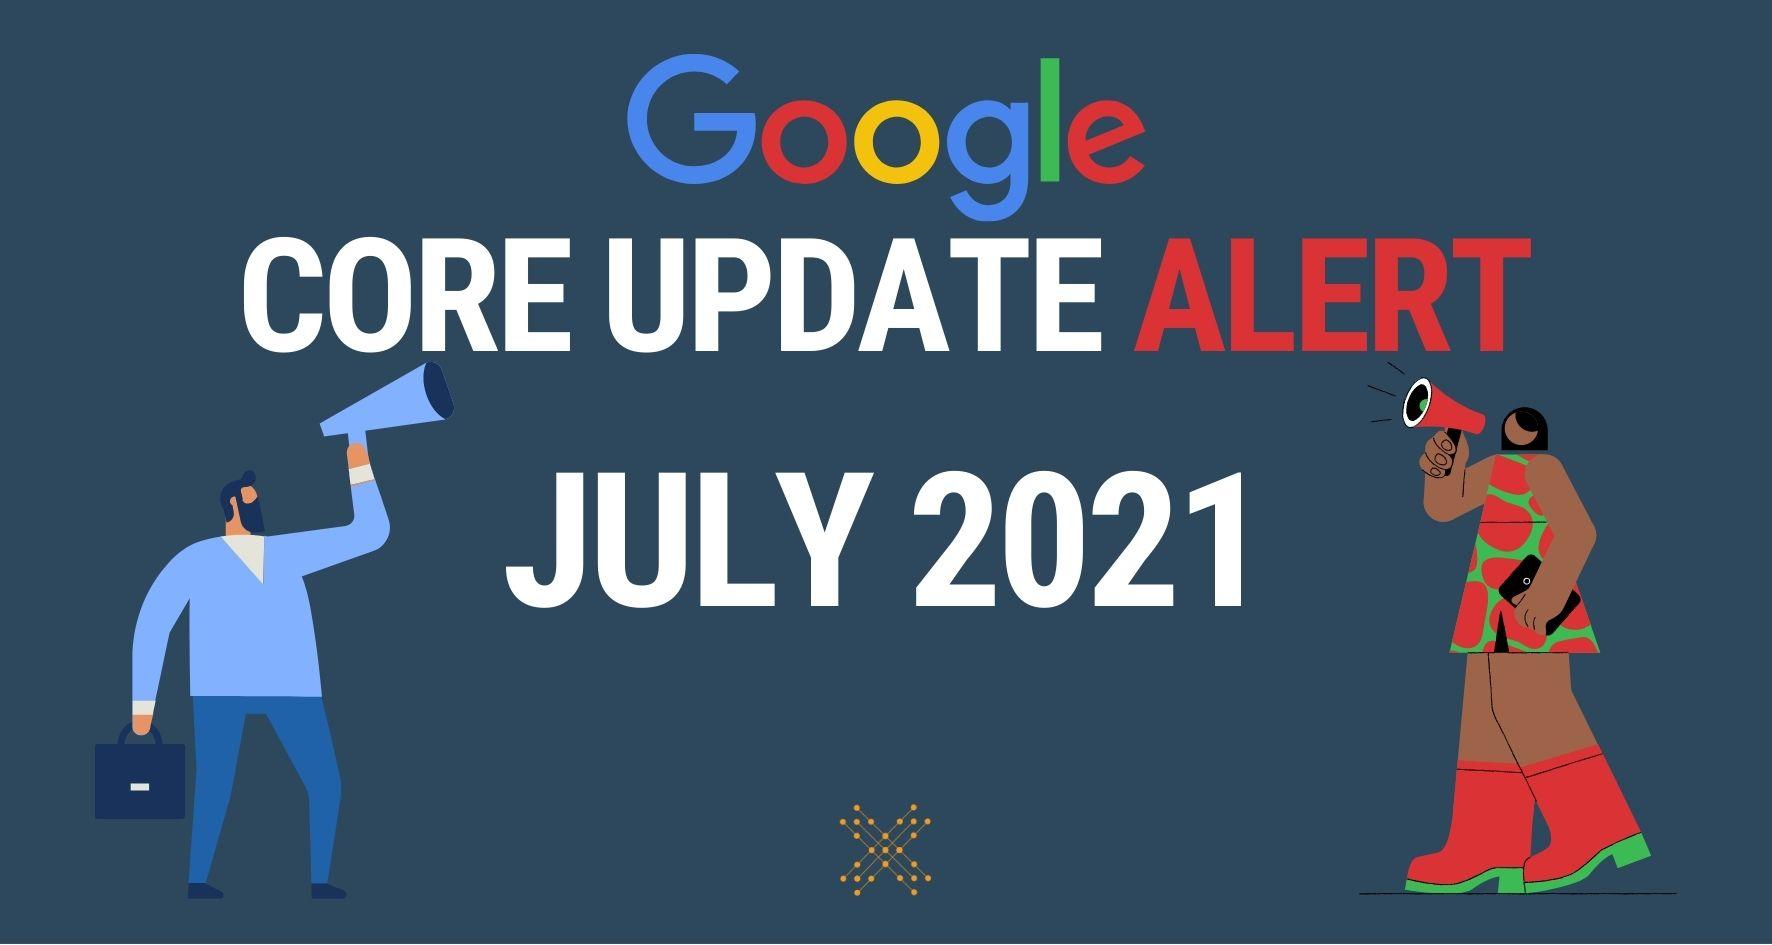 Google Core Update Alert July 2021